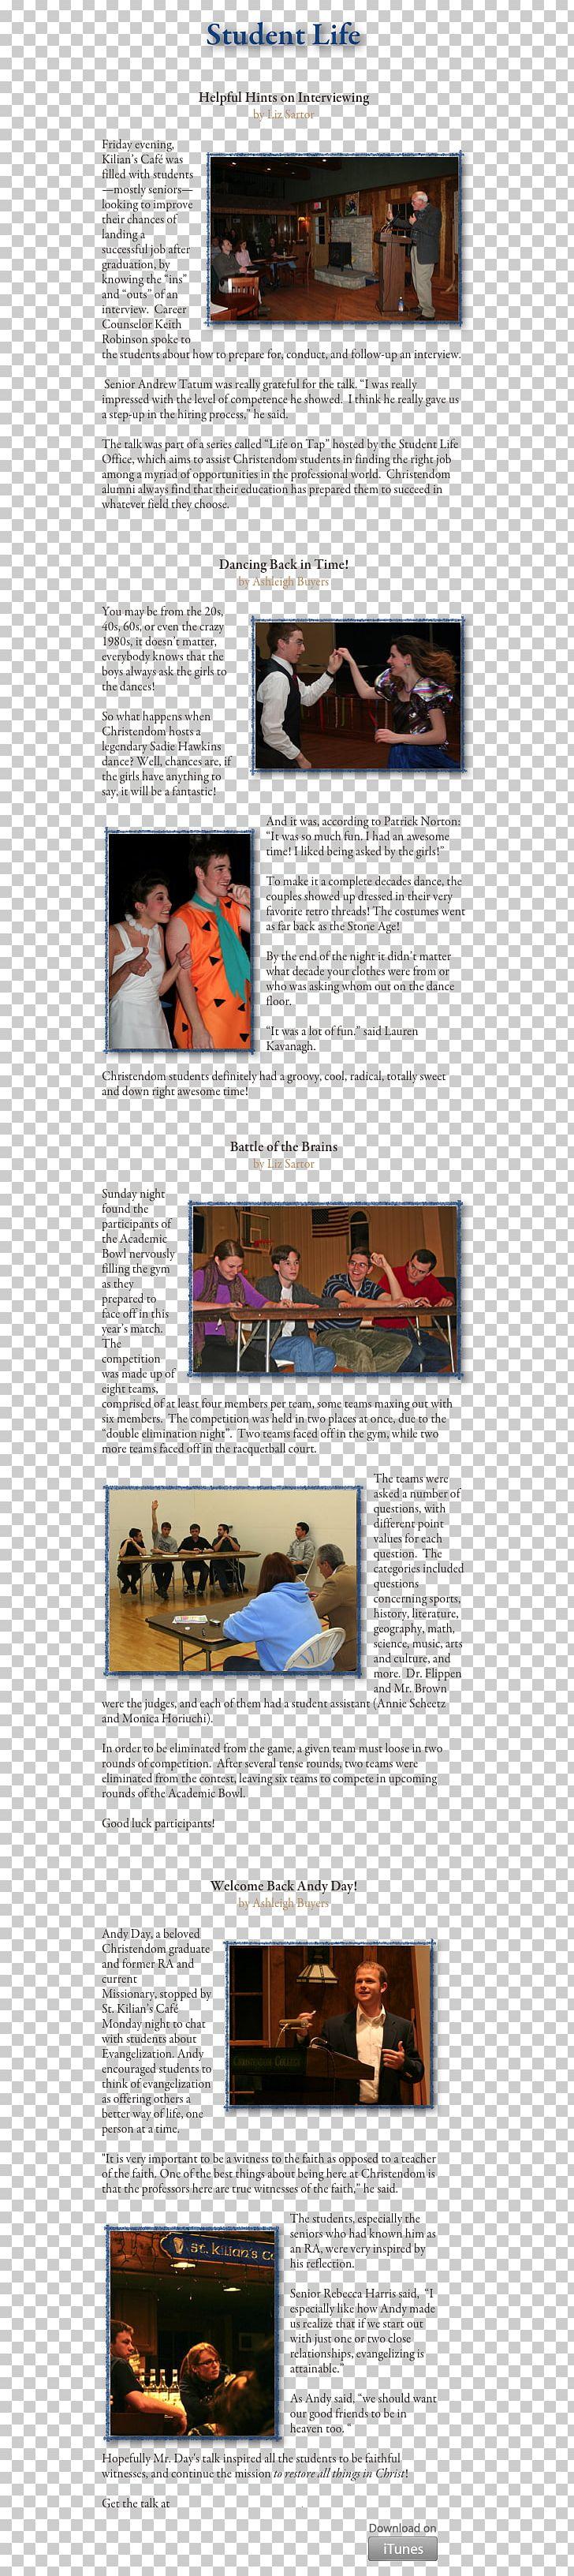 Brochure PNG, Clipart, Brochure, Text Free PNG Download